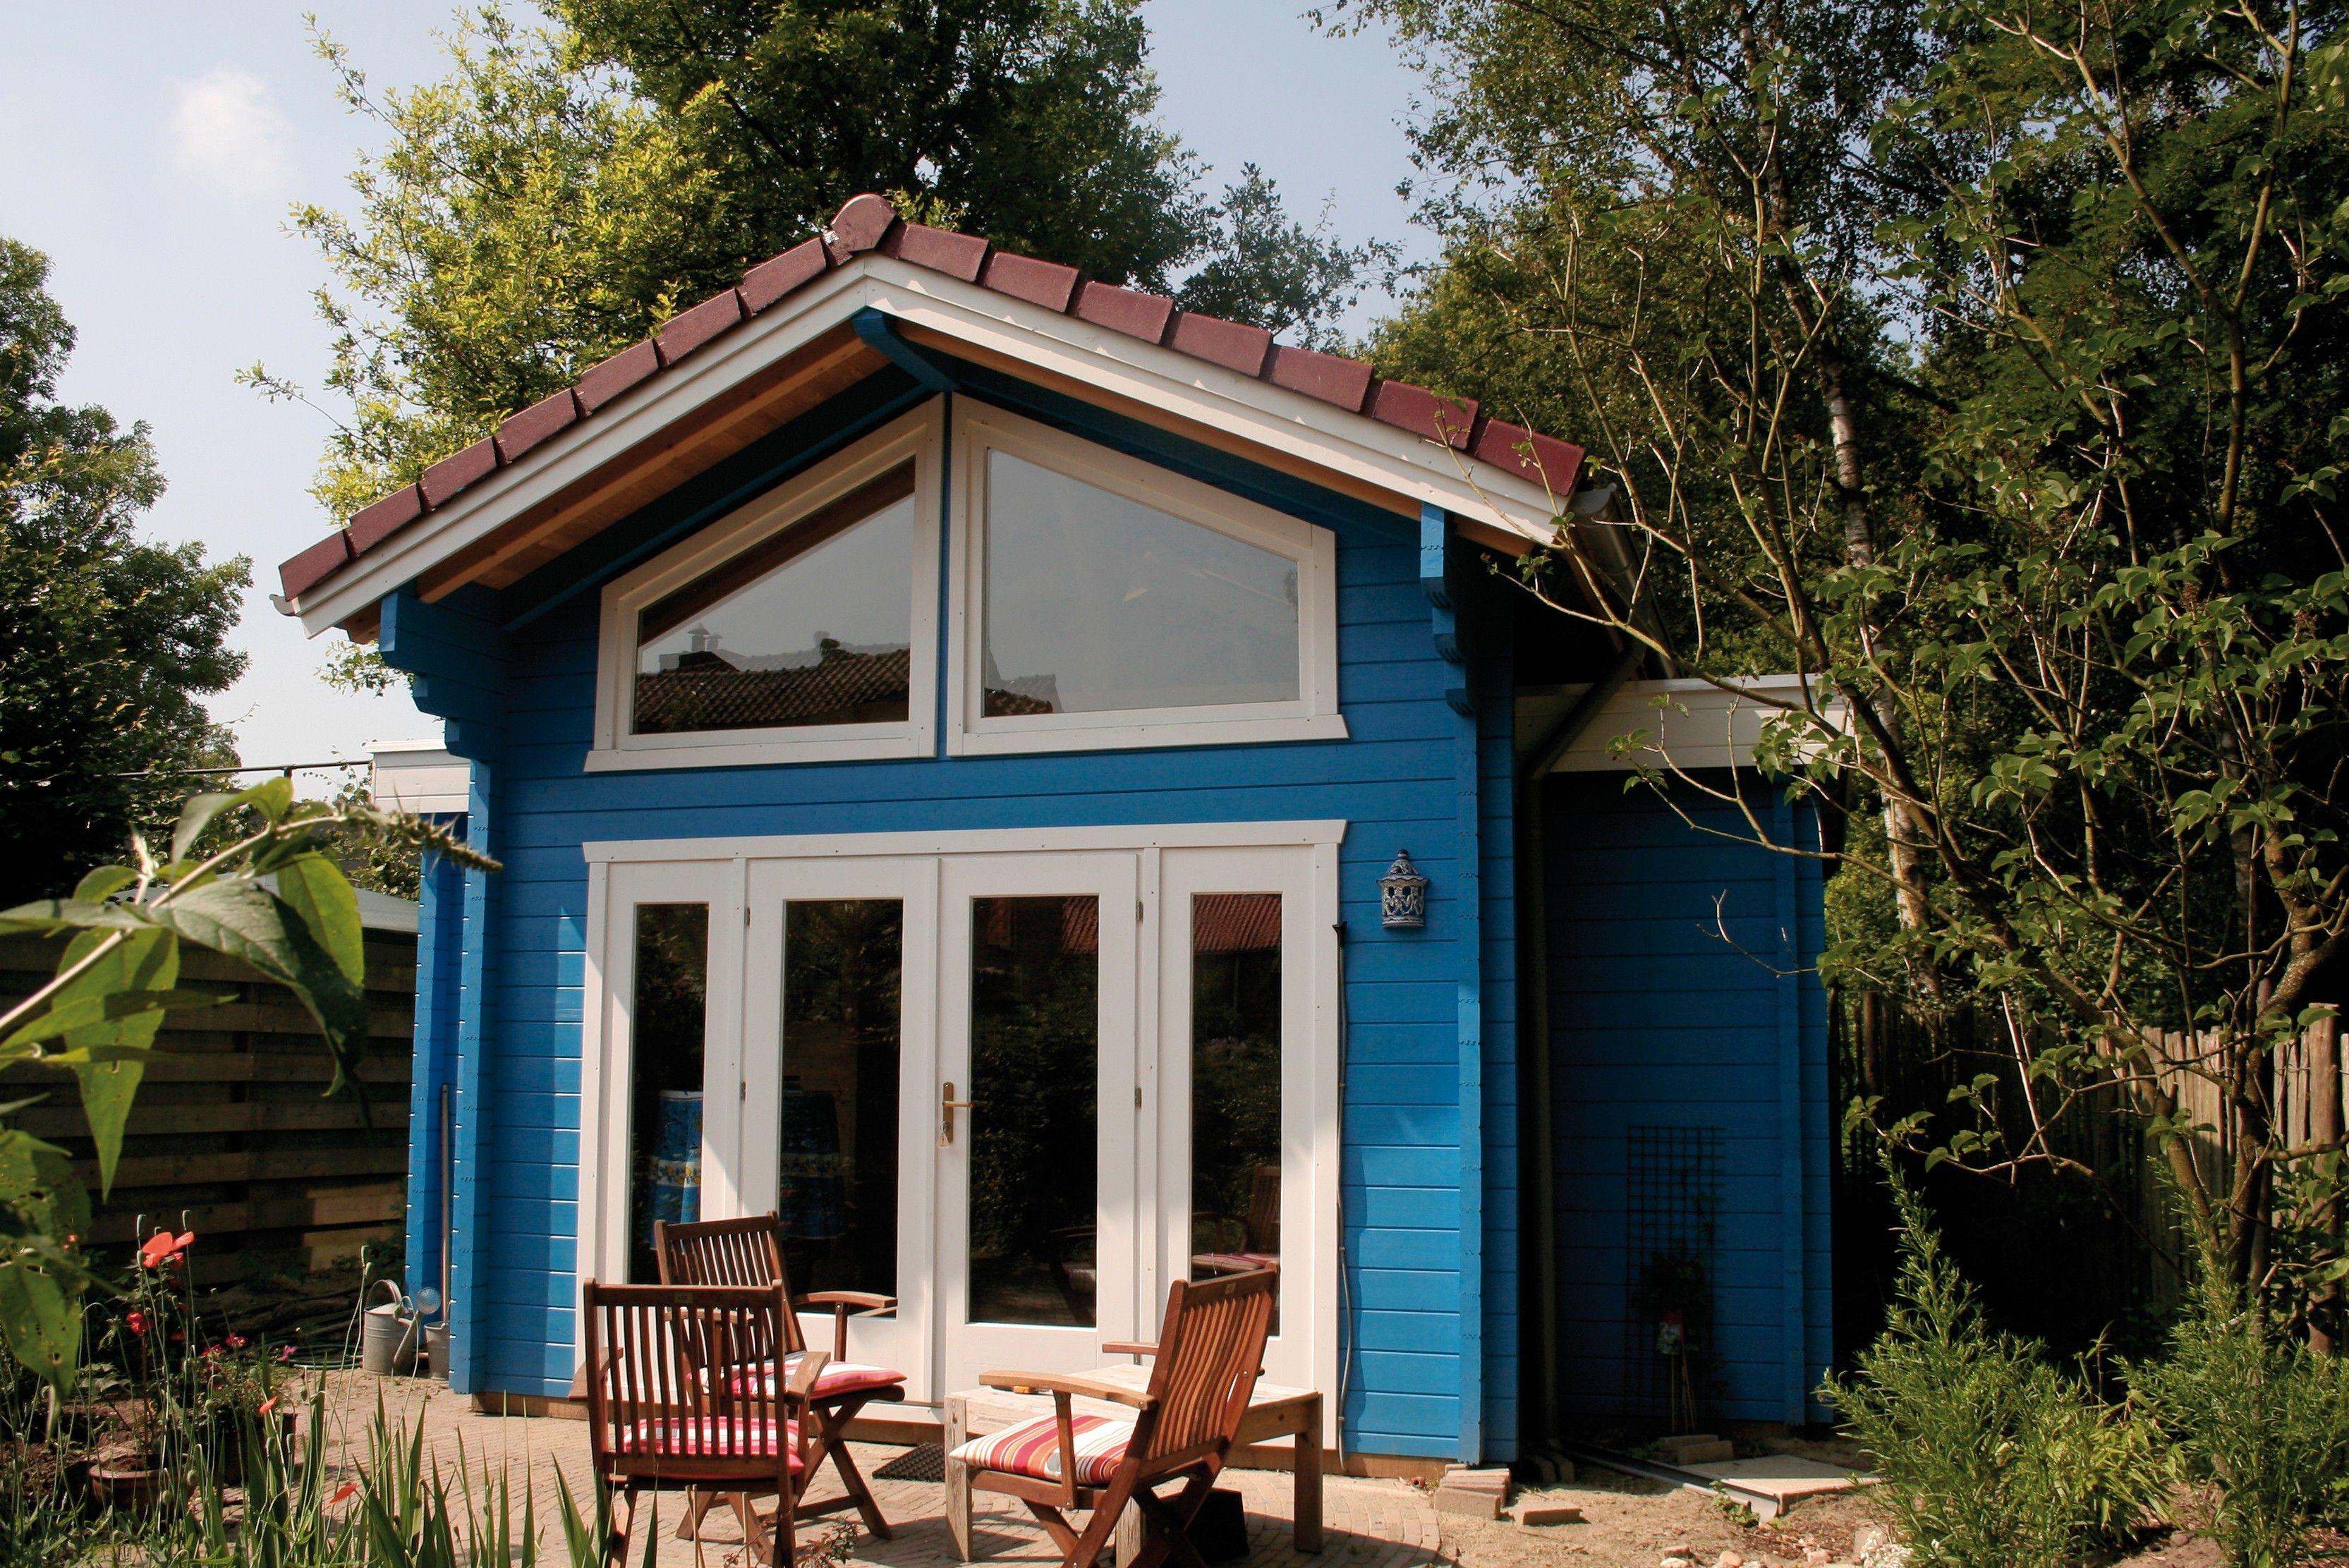 Chalet en bois Neuvy cabanes Pinterest